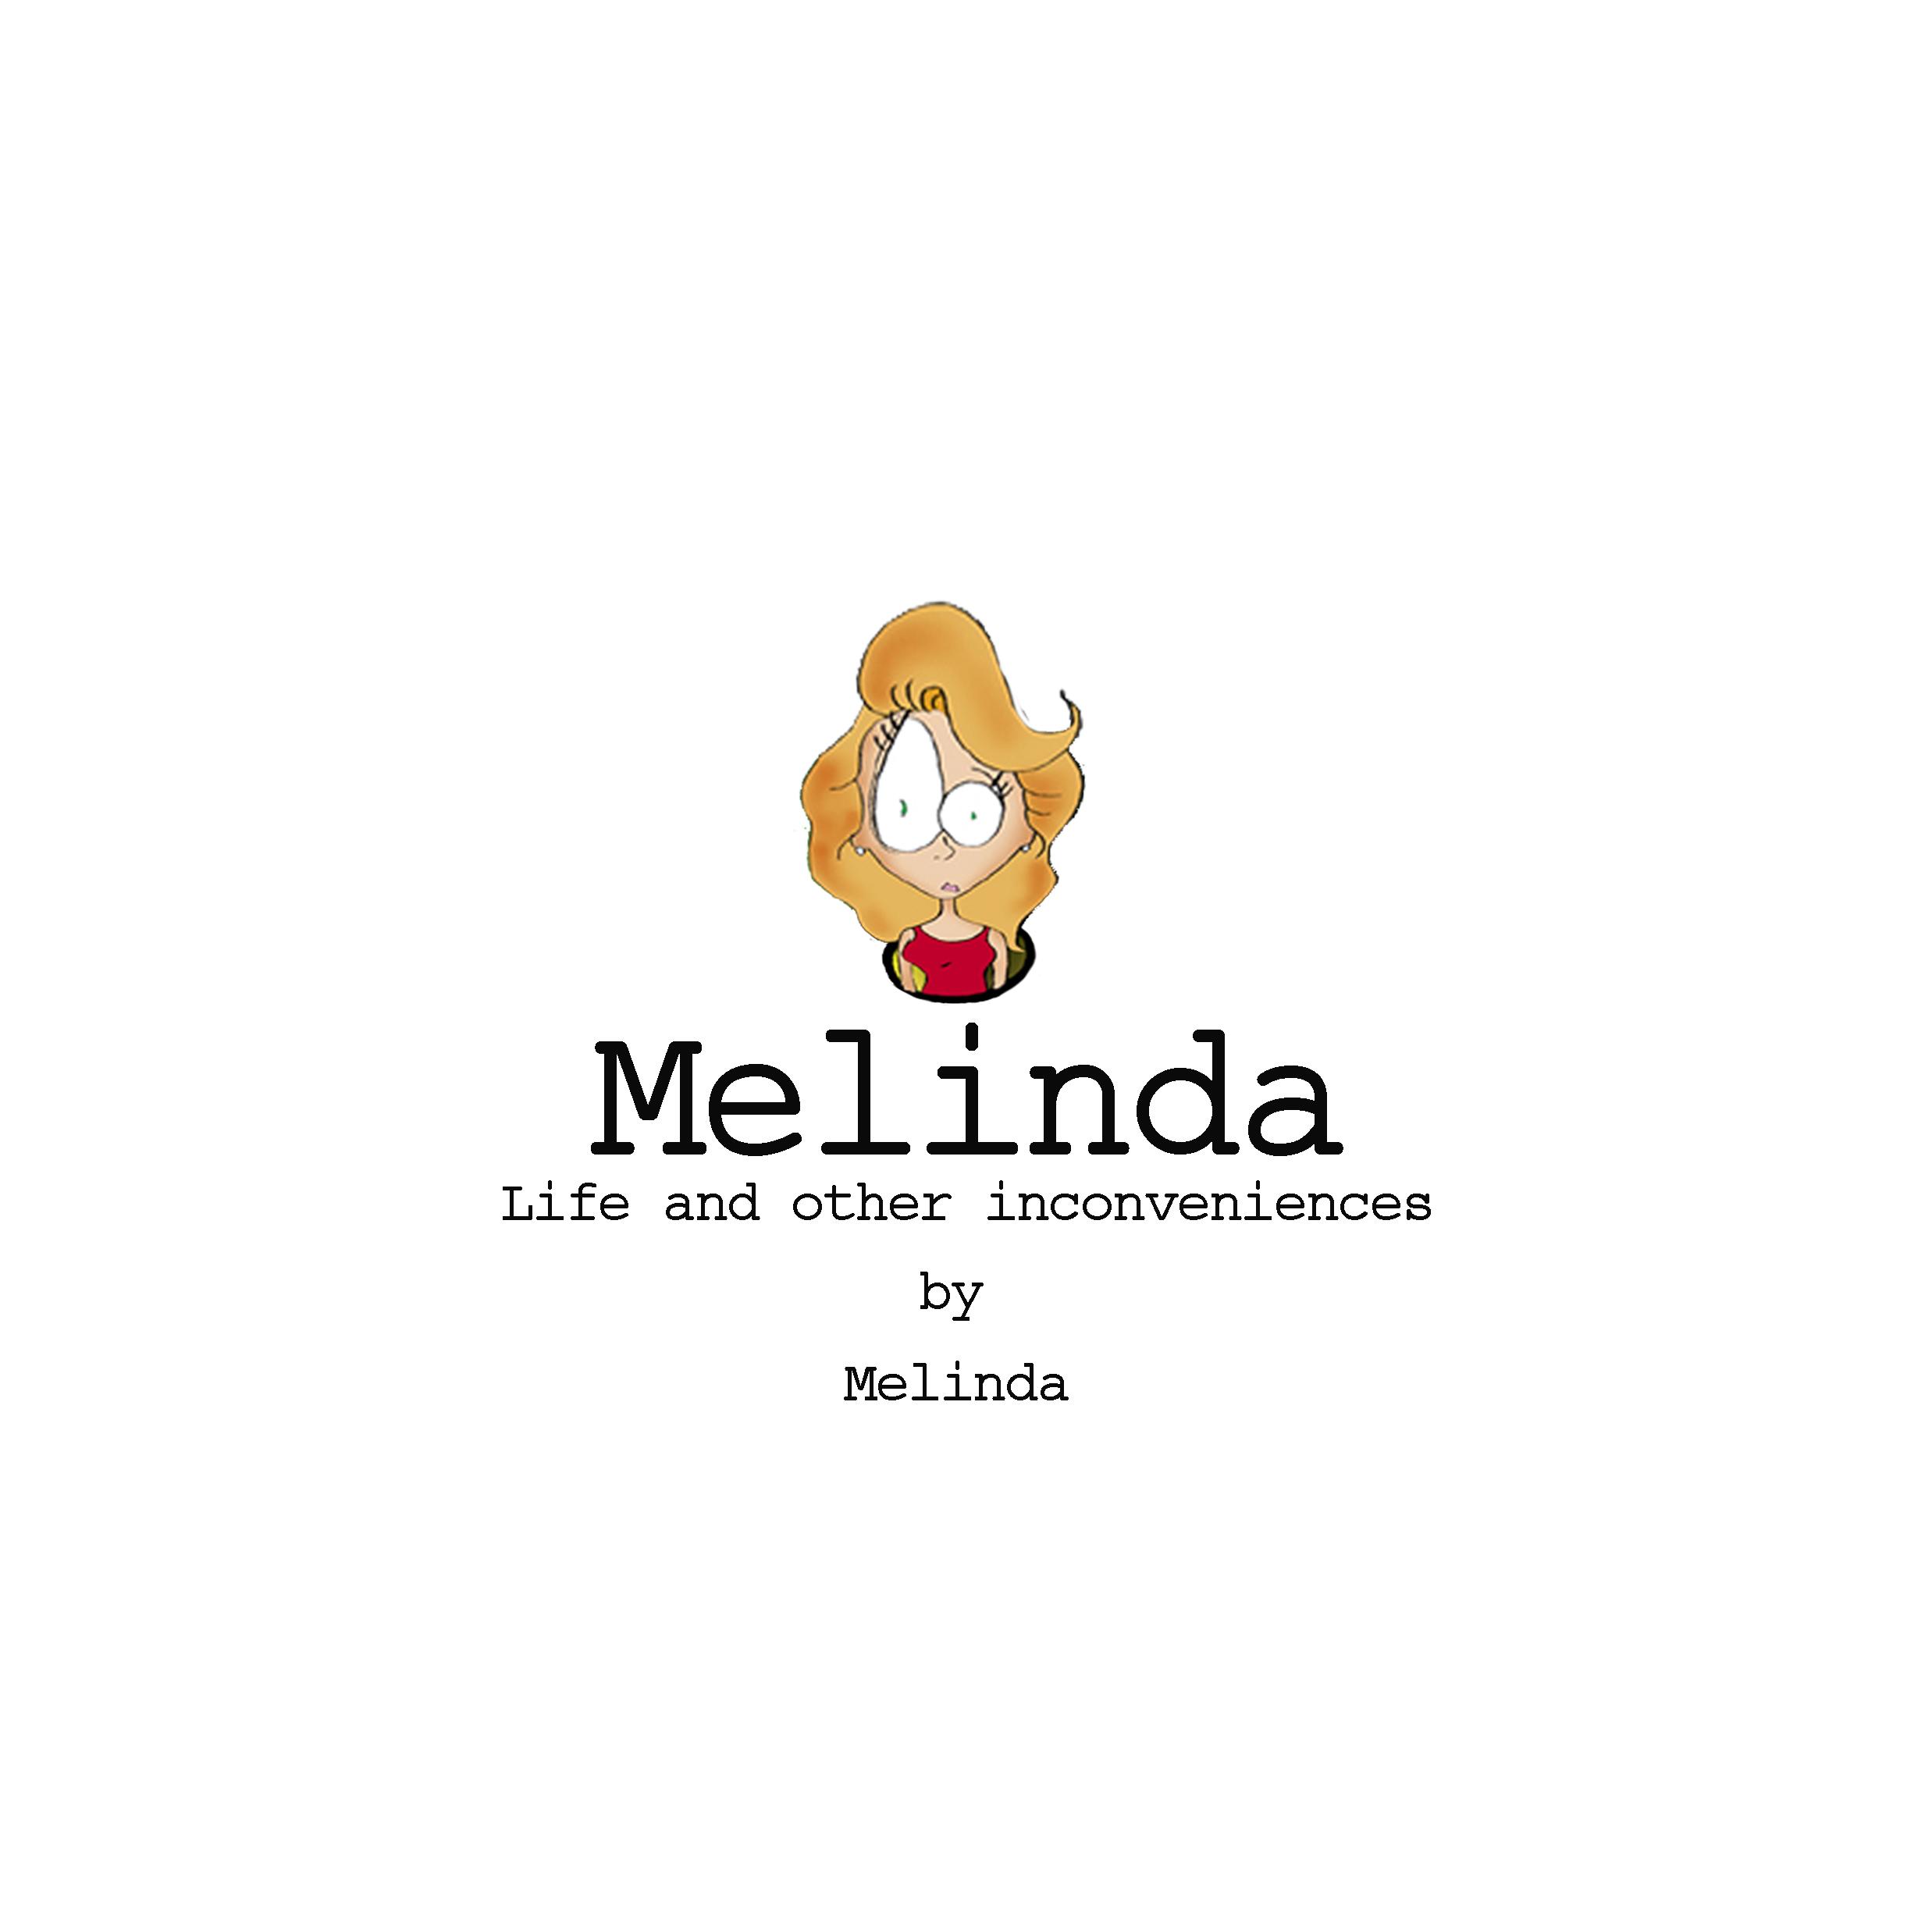 Melinda BookCover 2017.jpg